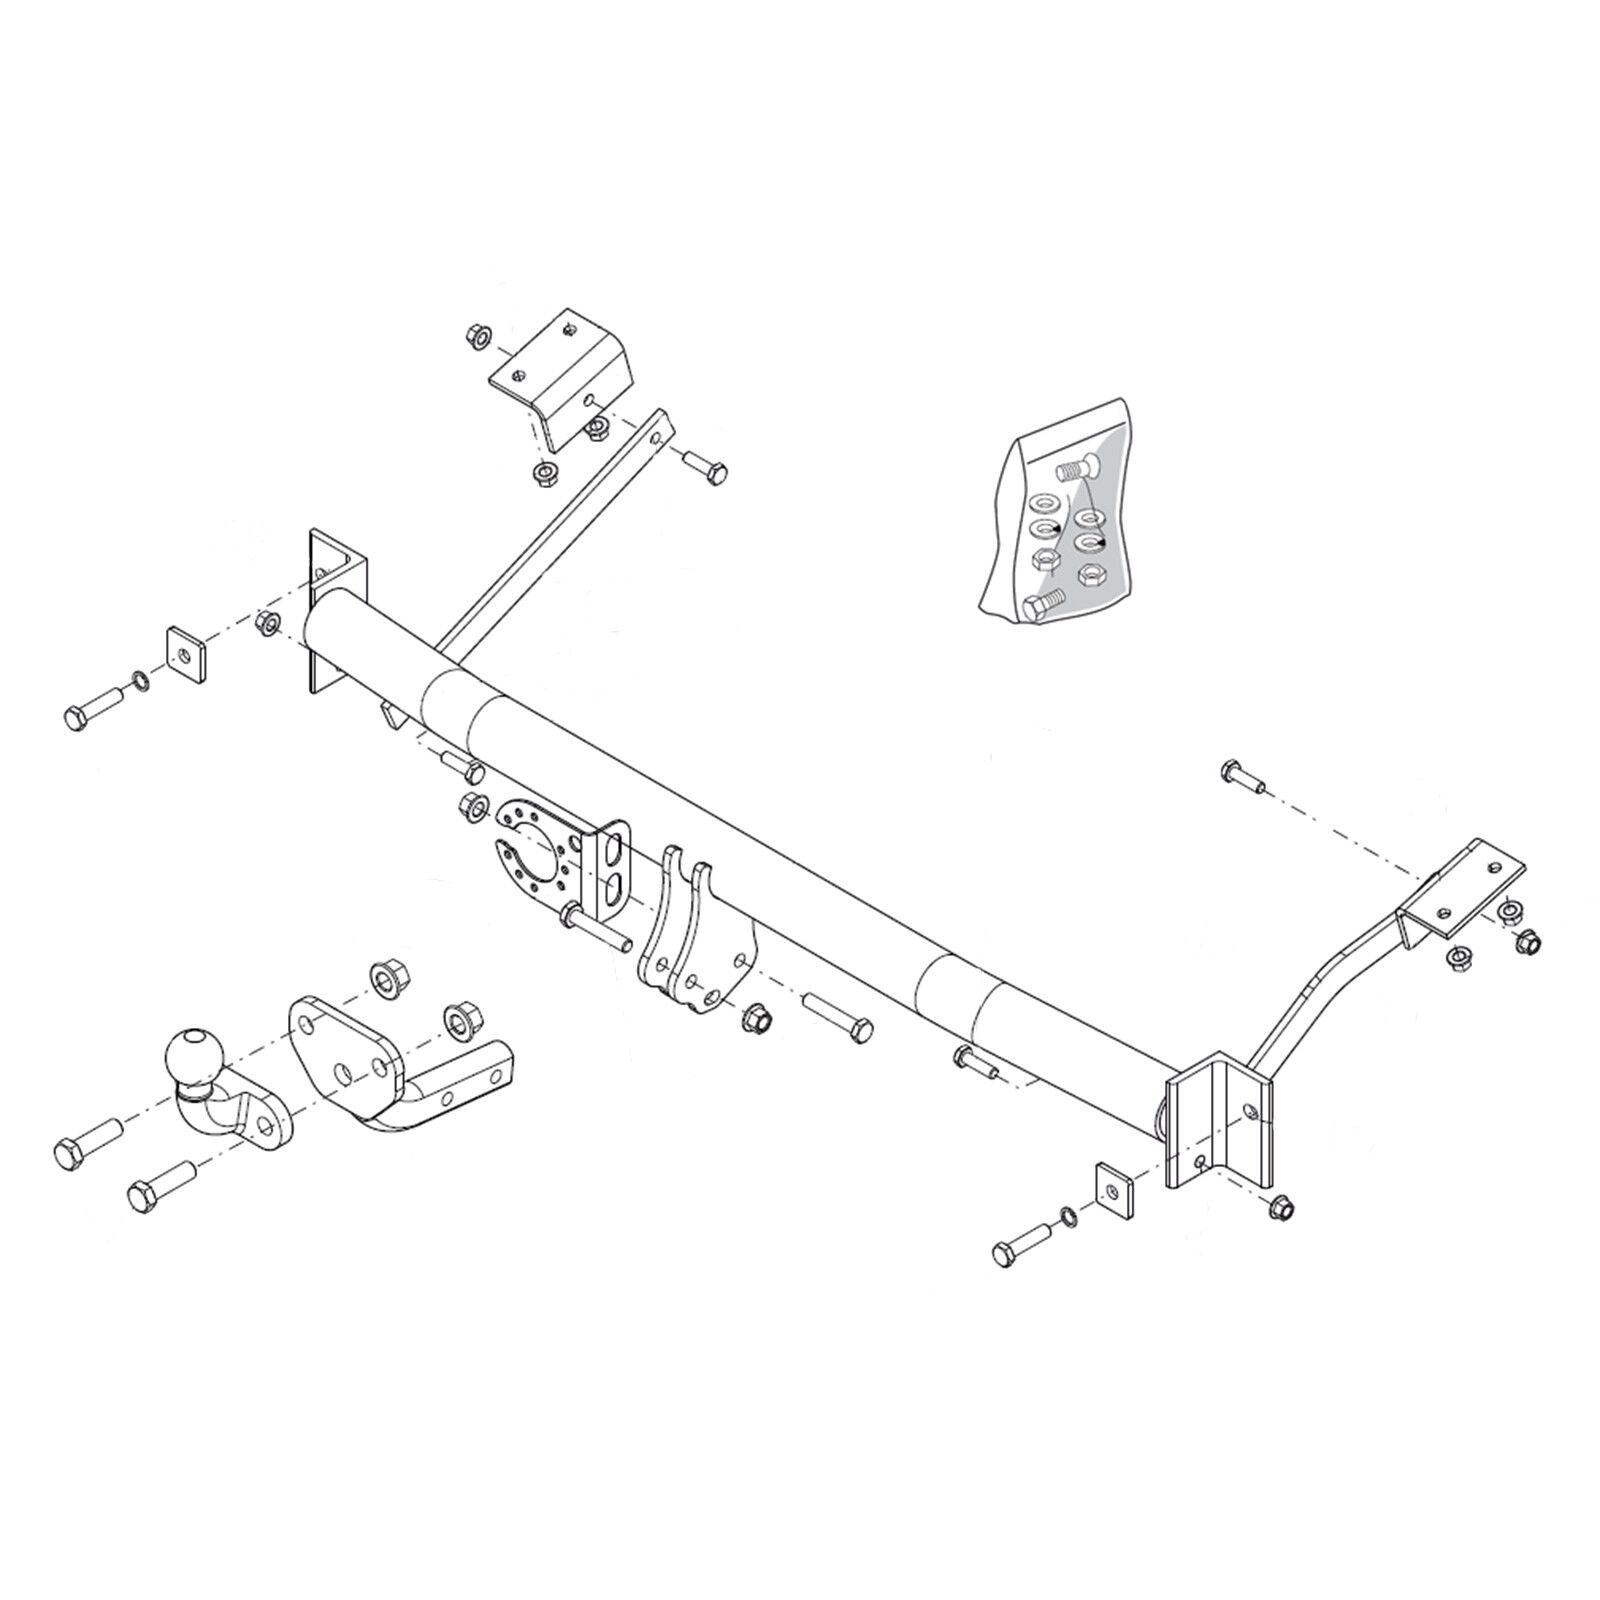 Citroen C3 Fuse Box Layout